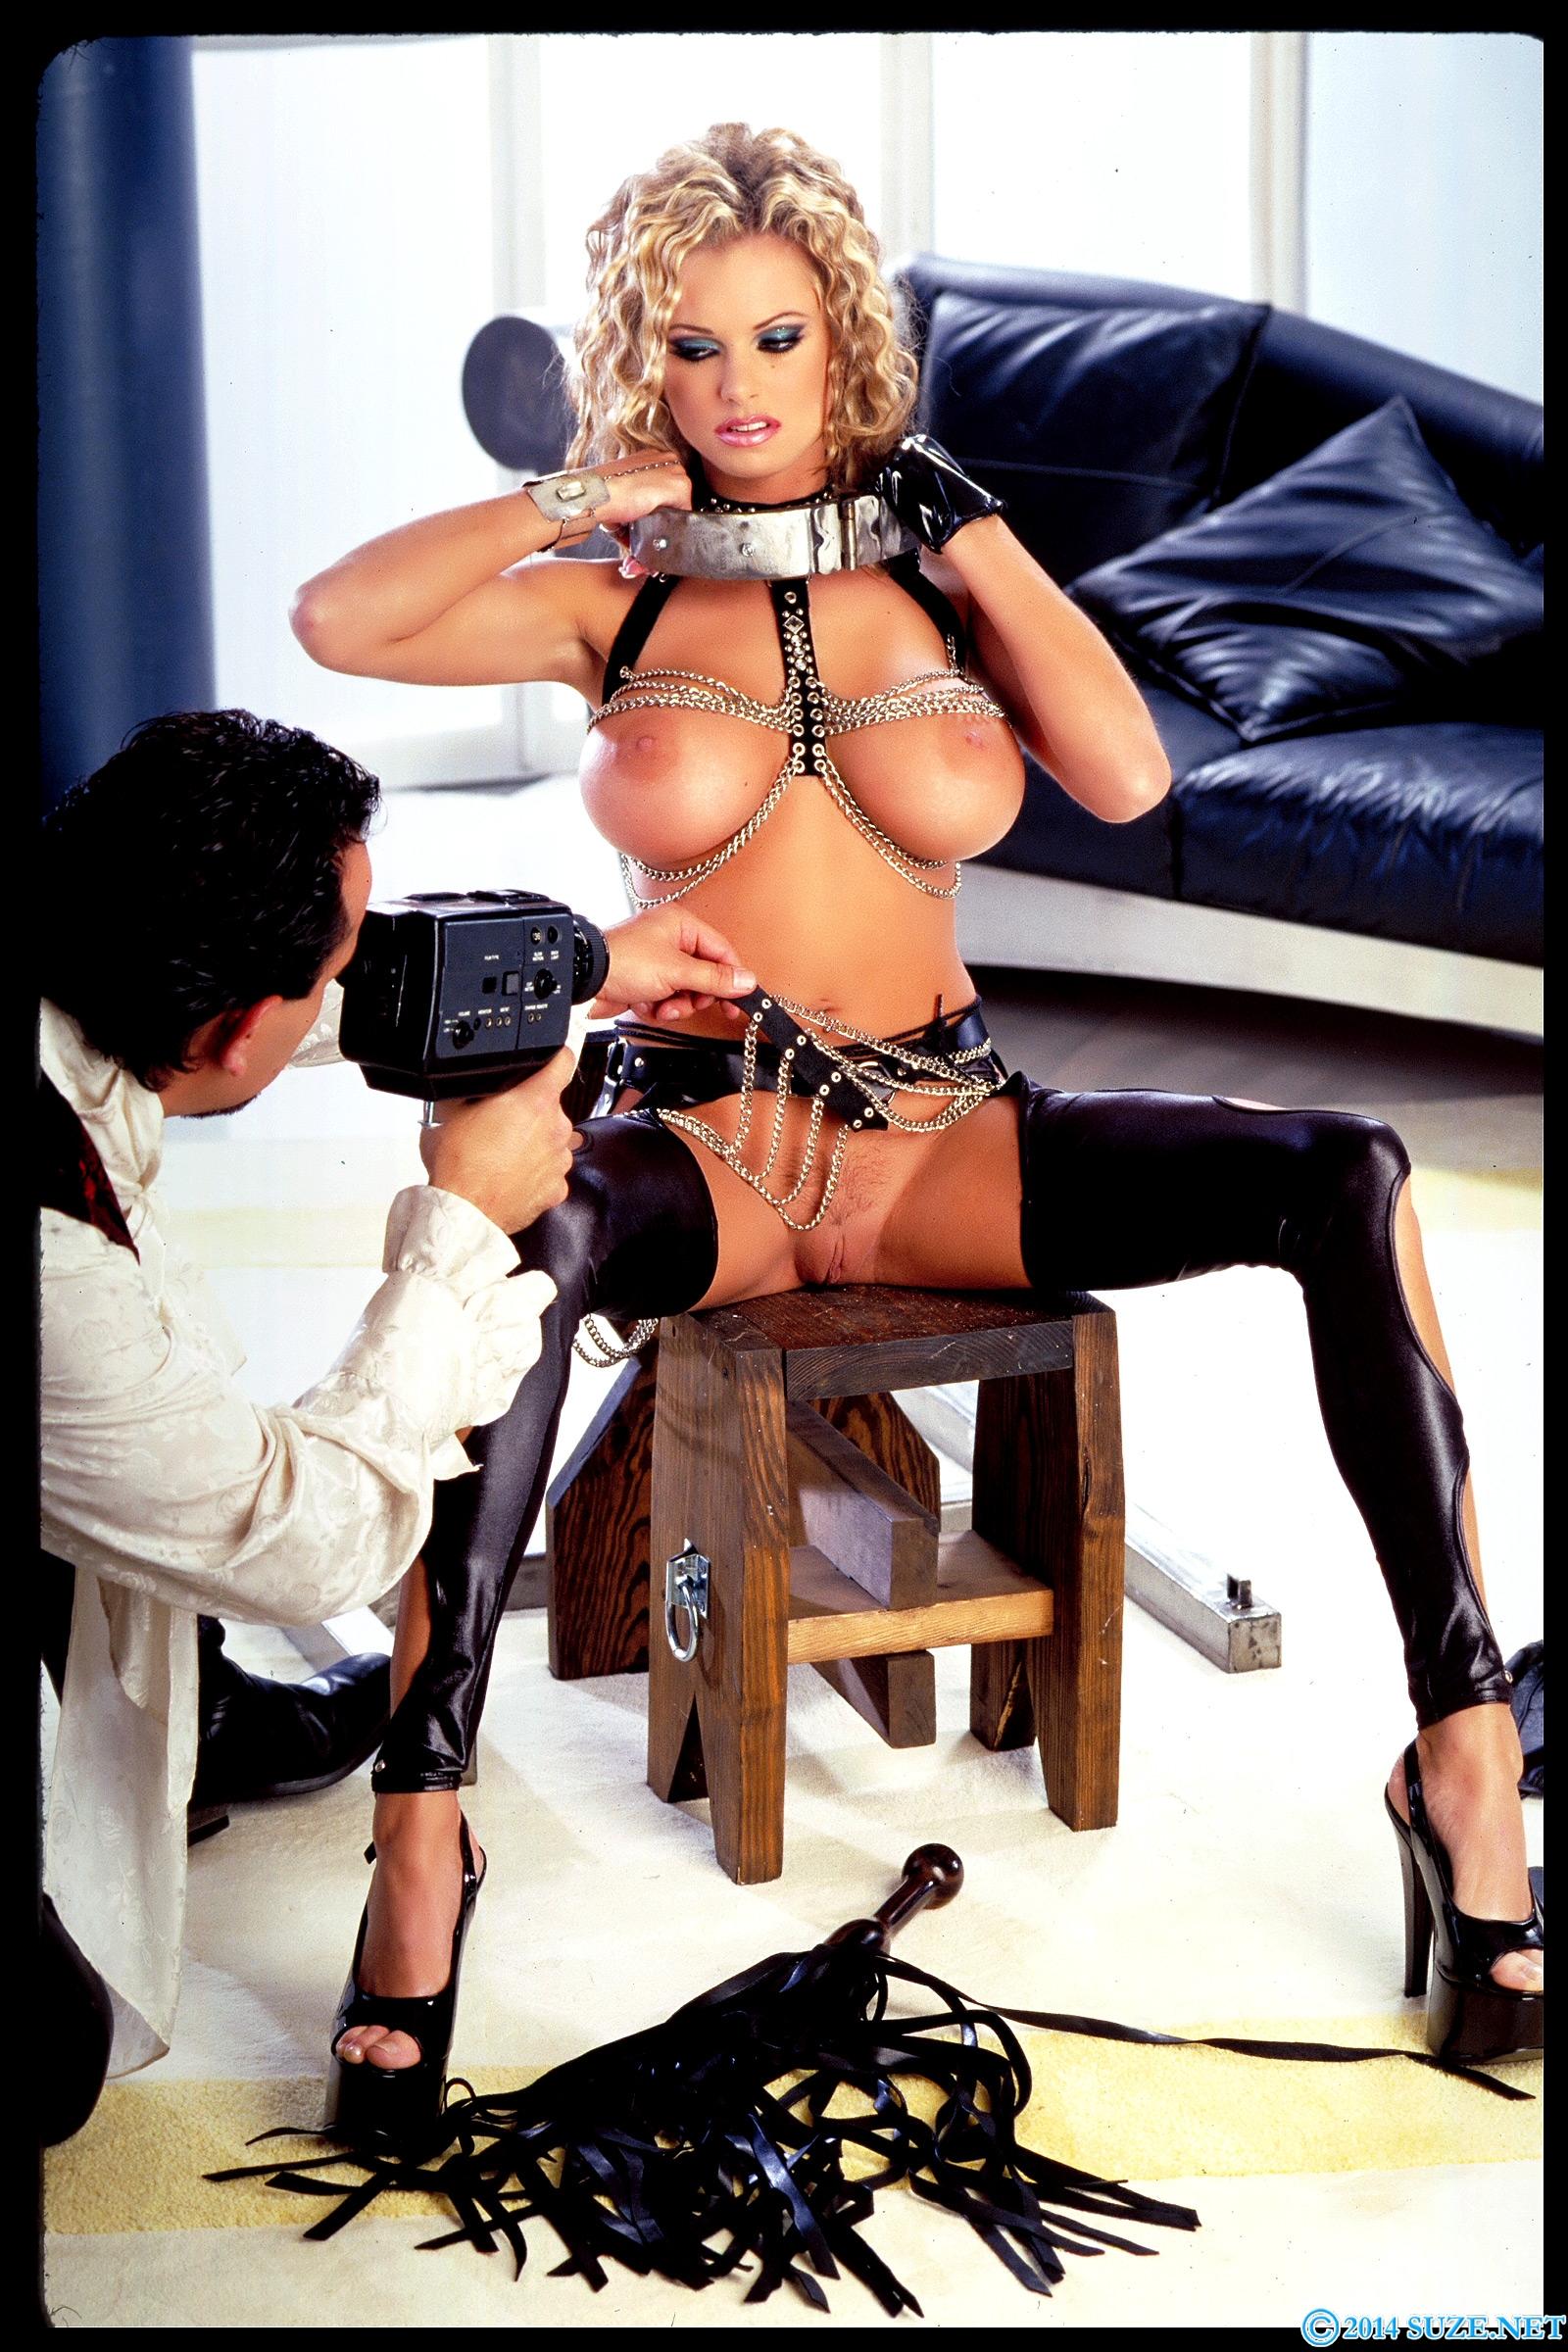 site briana clip banks Porn